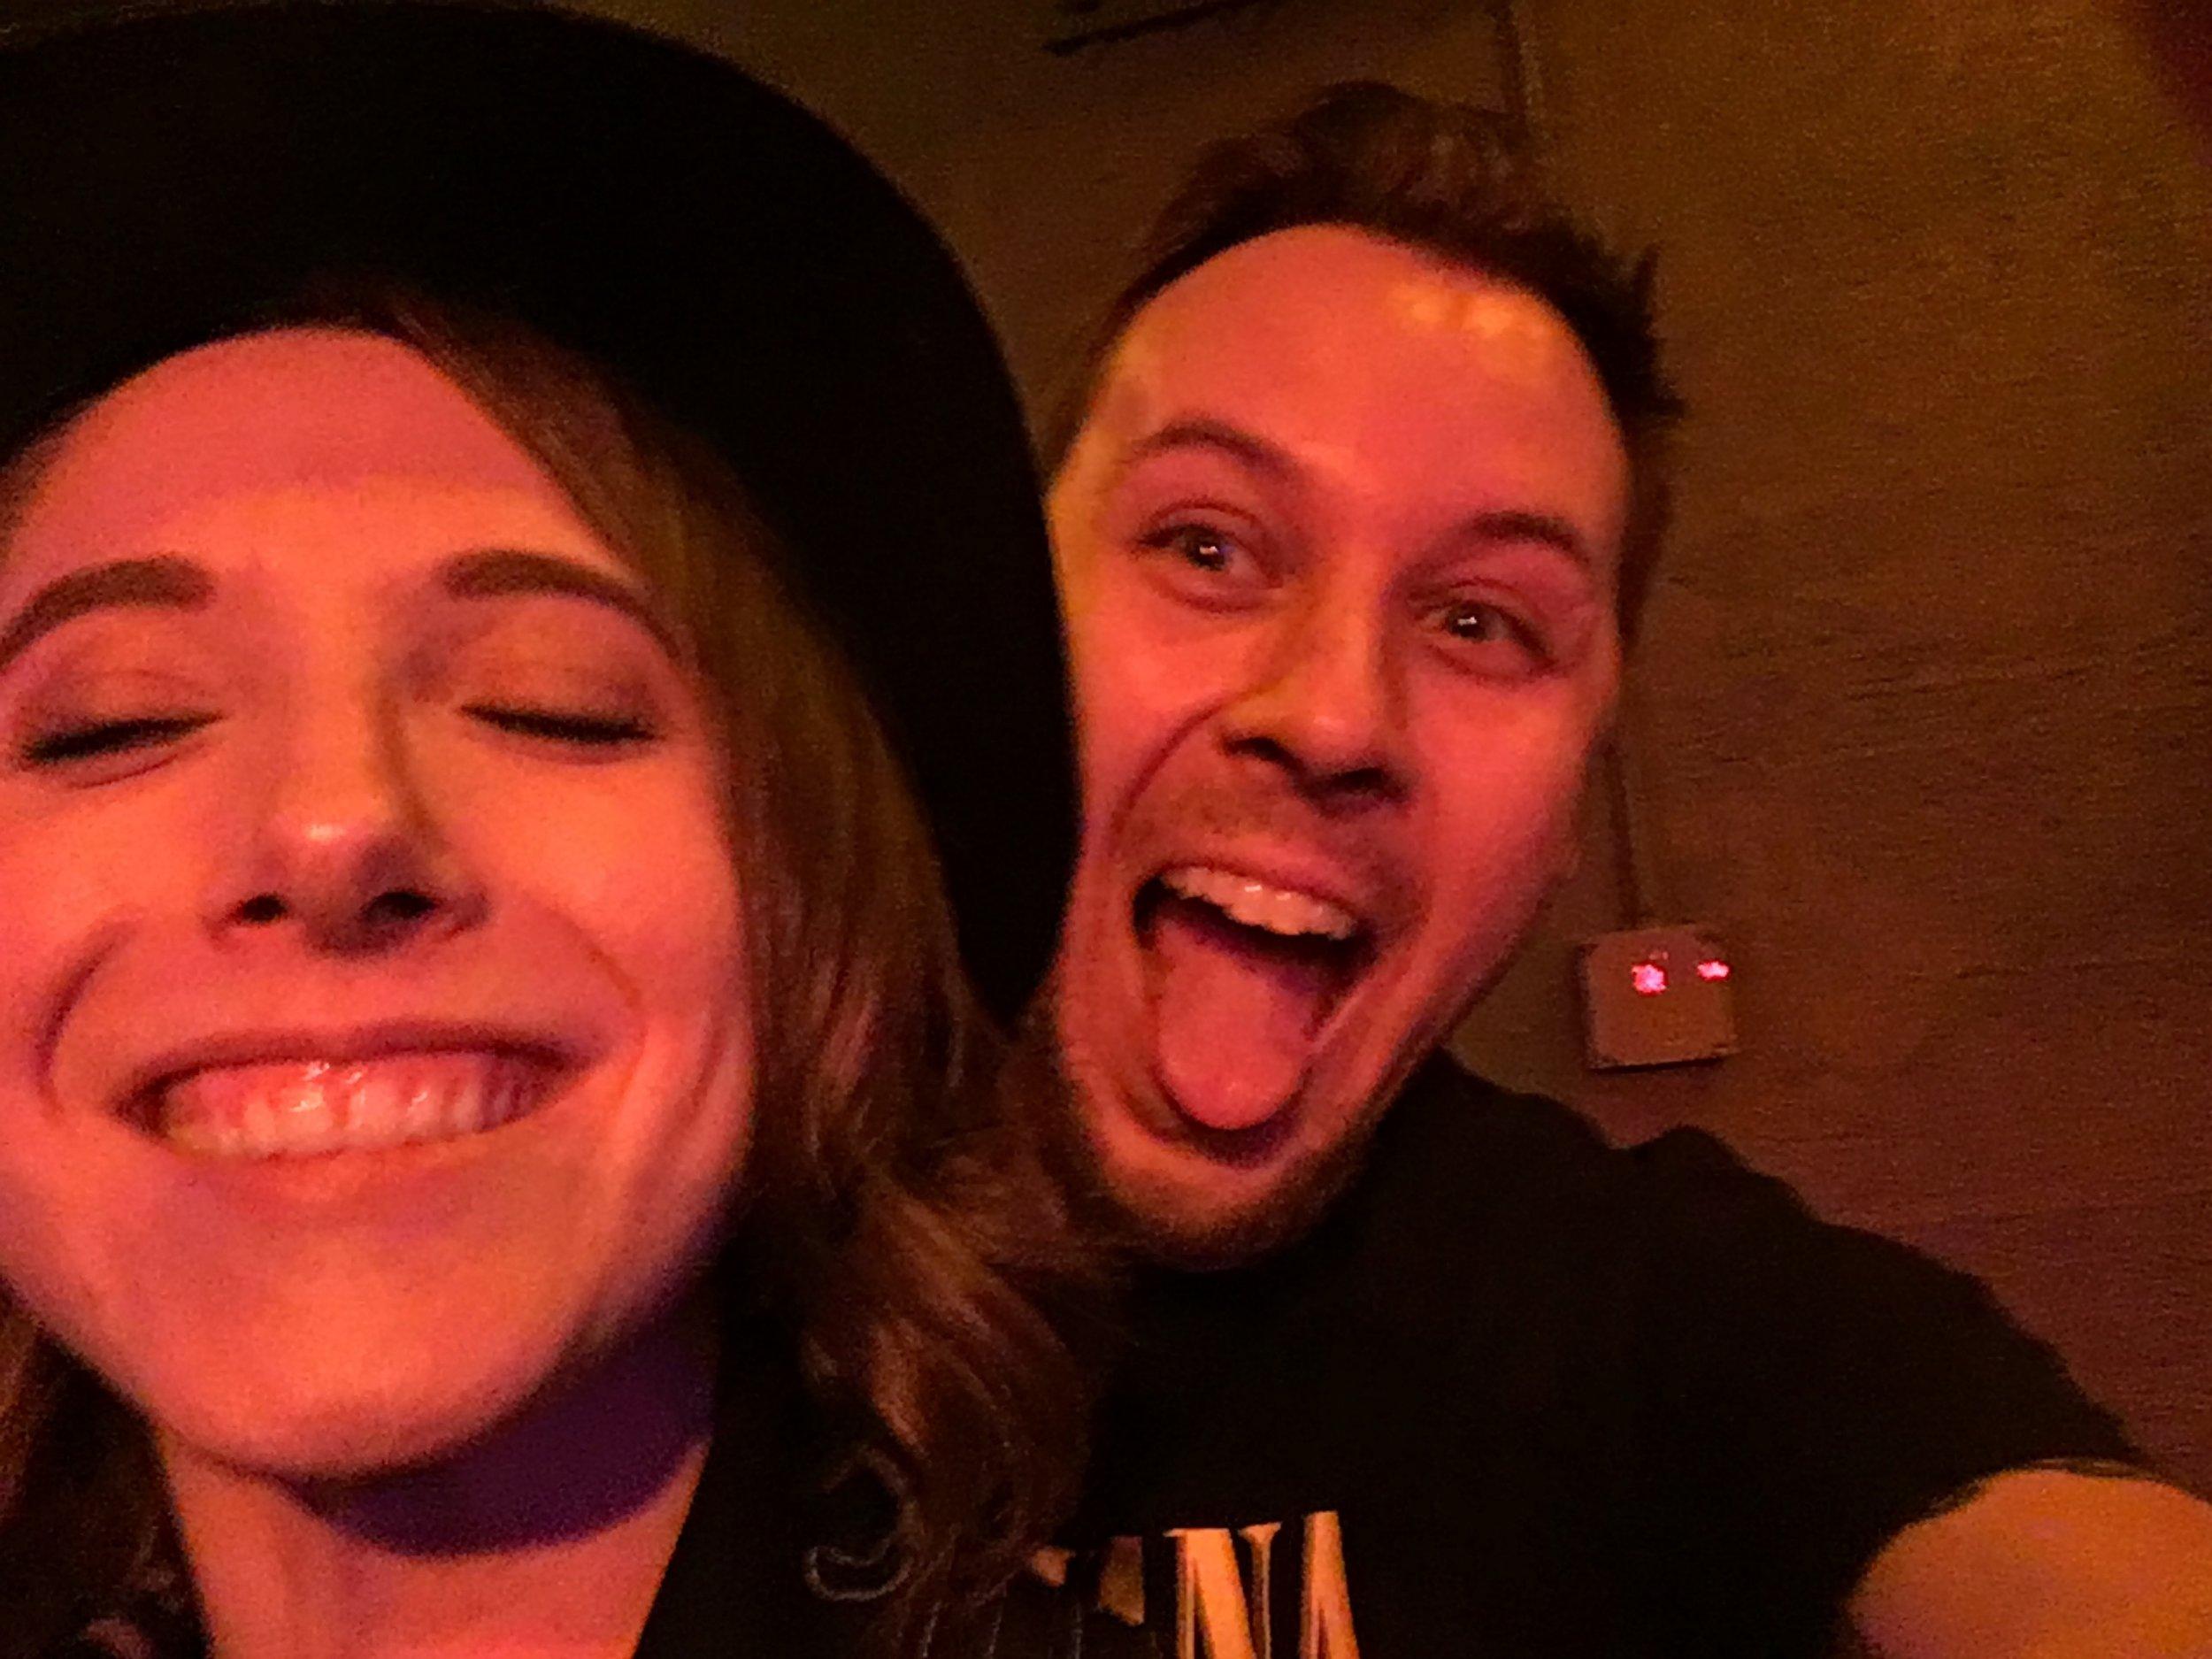 Stage selfie with Hayley Lynn. I'm so weird.